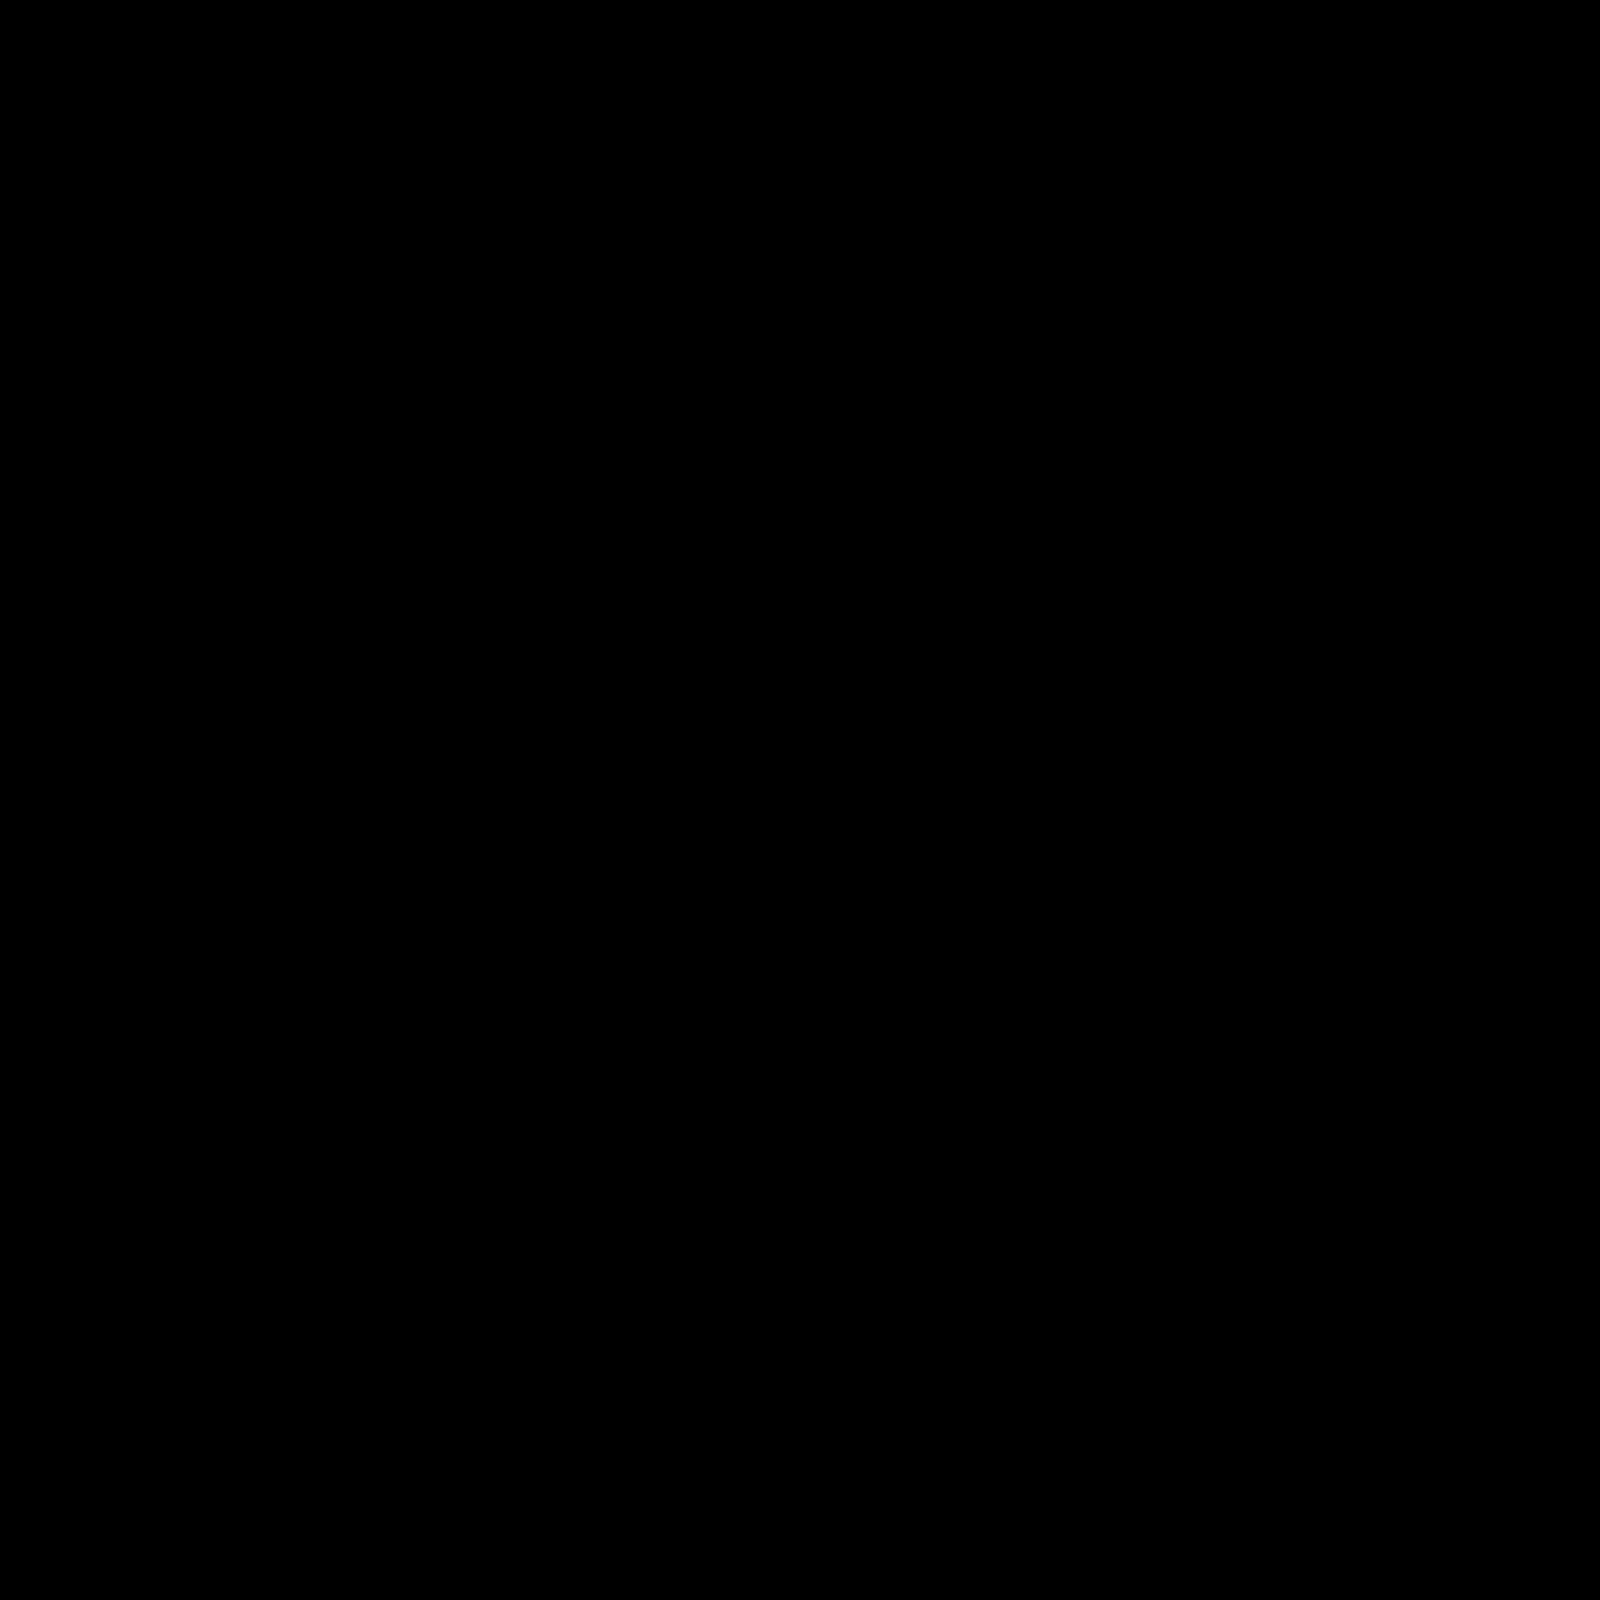 2 of Hearts icon